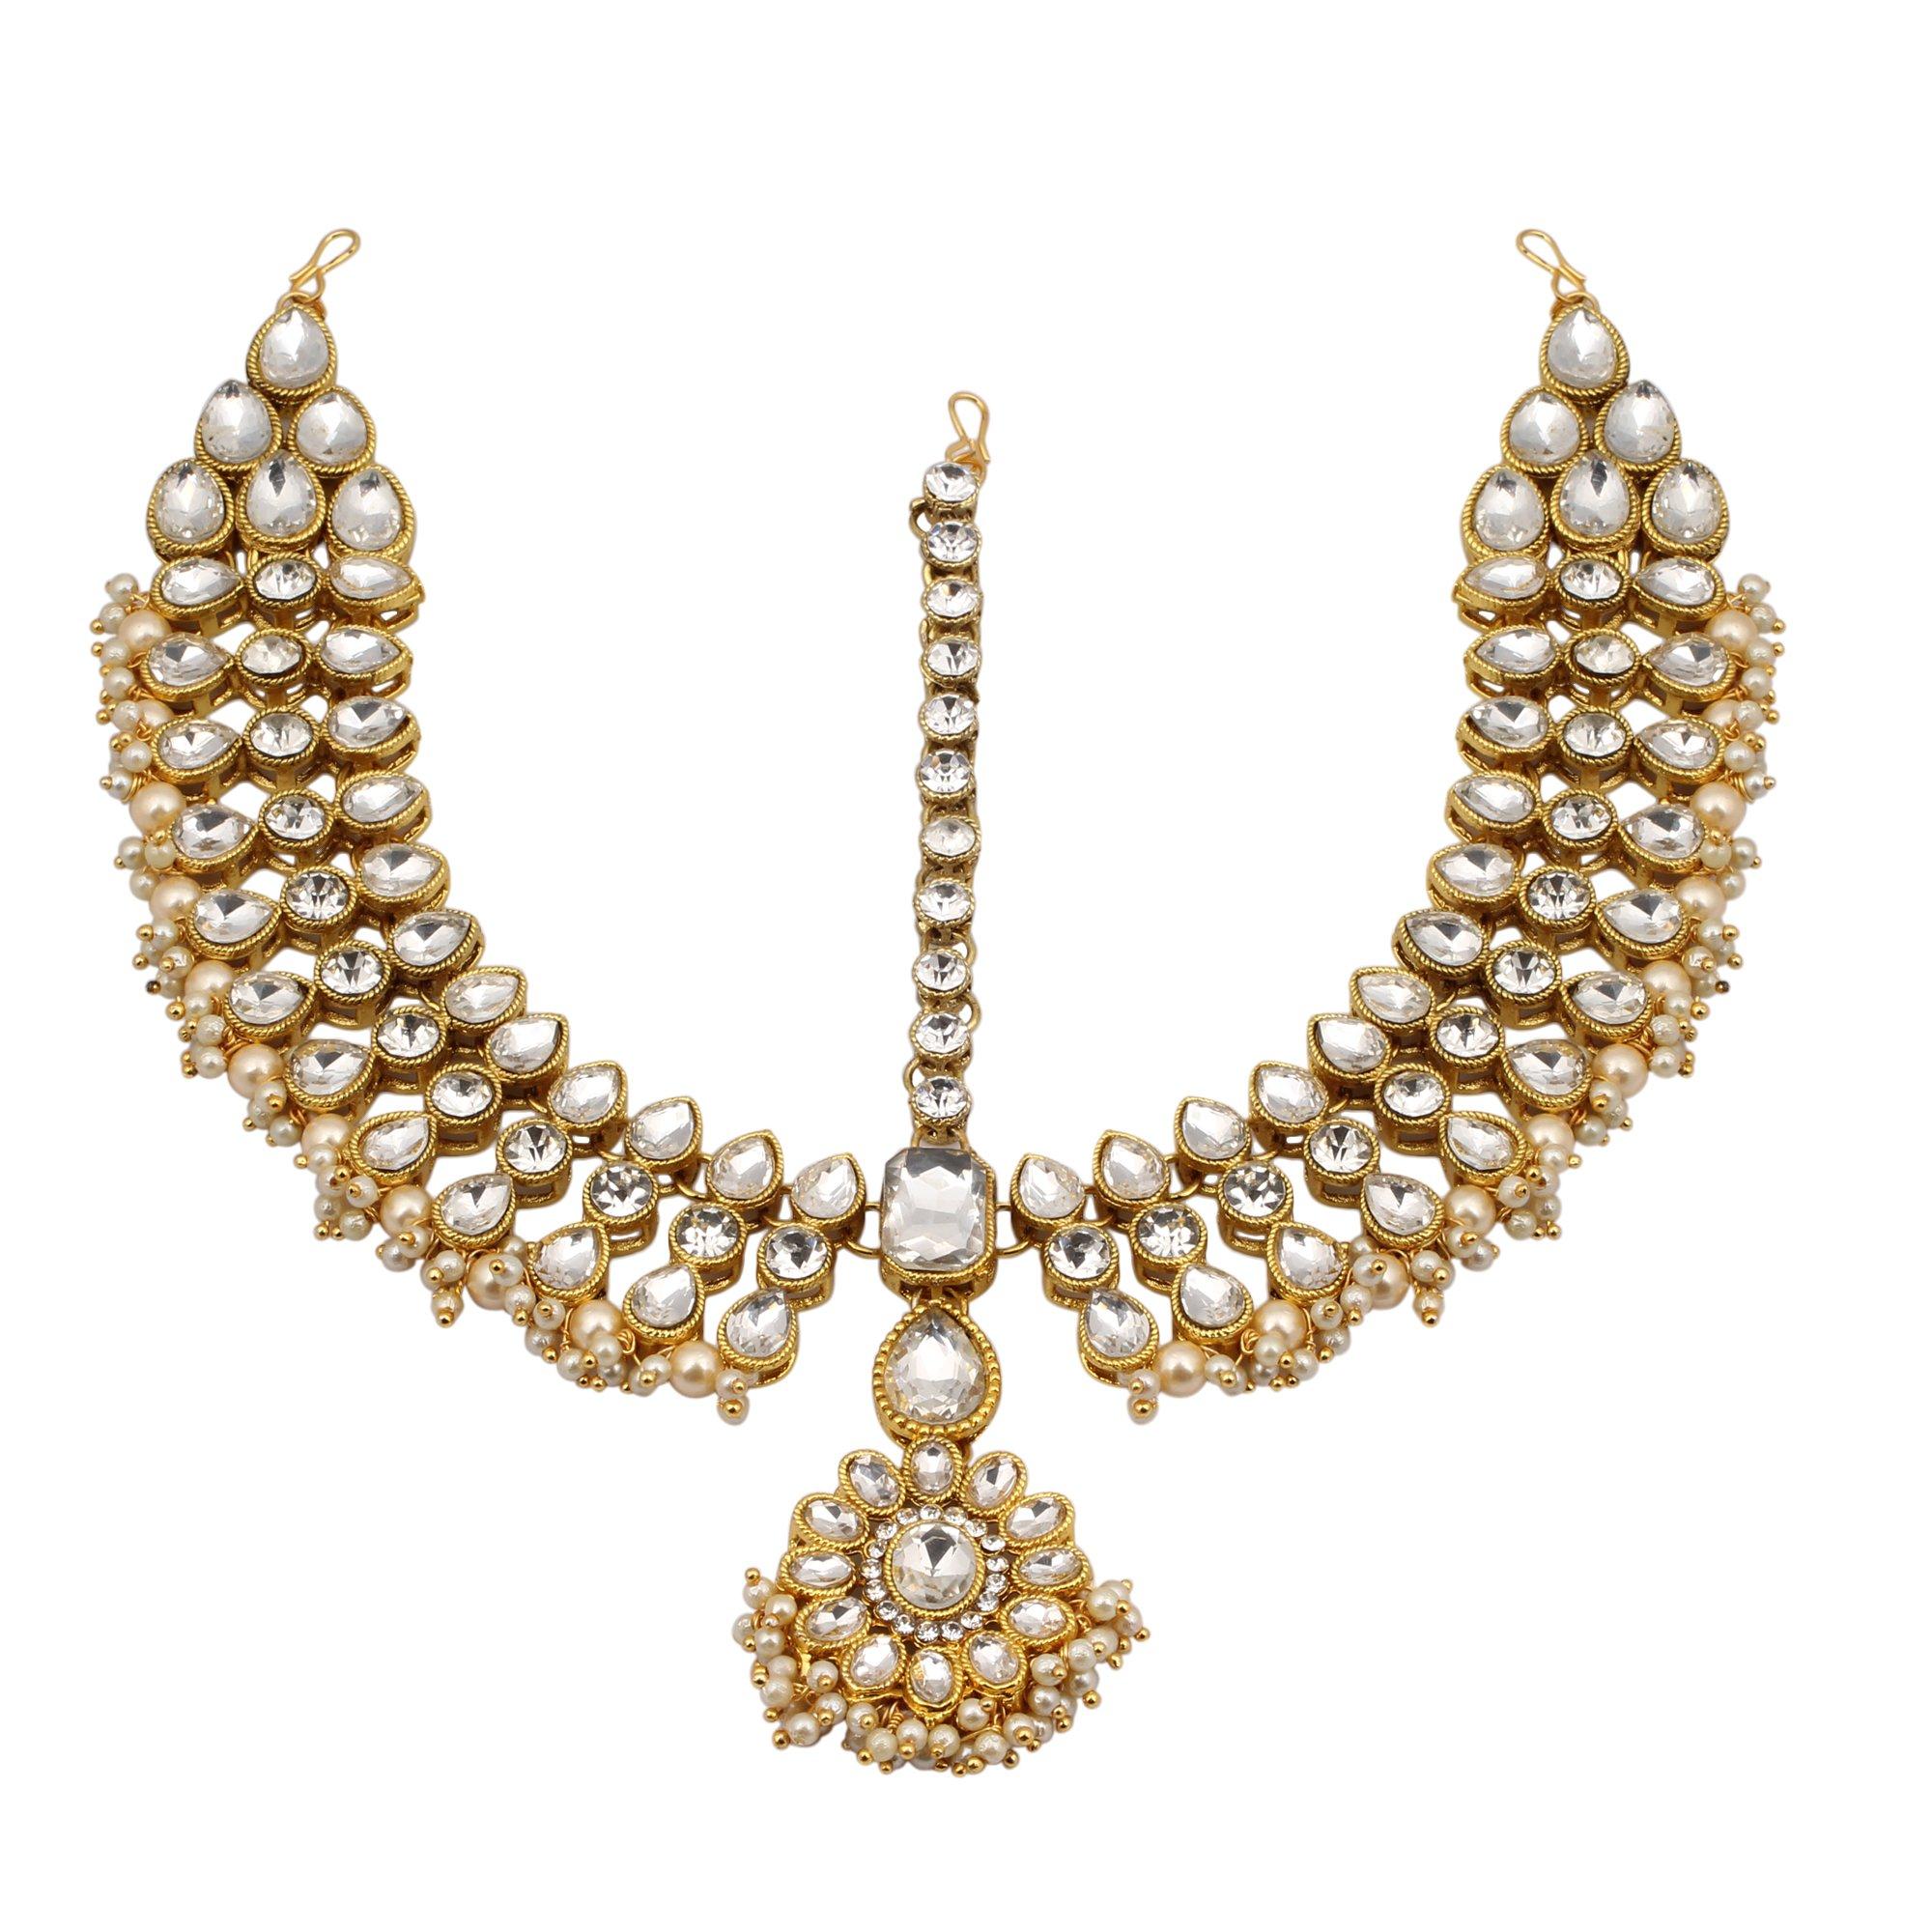 Jwellmart Indian Ethnic CZ Kundan Faux Pearl Partywear Matha Patti Maang tikka for Women and Girls (Gold)